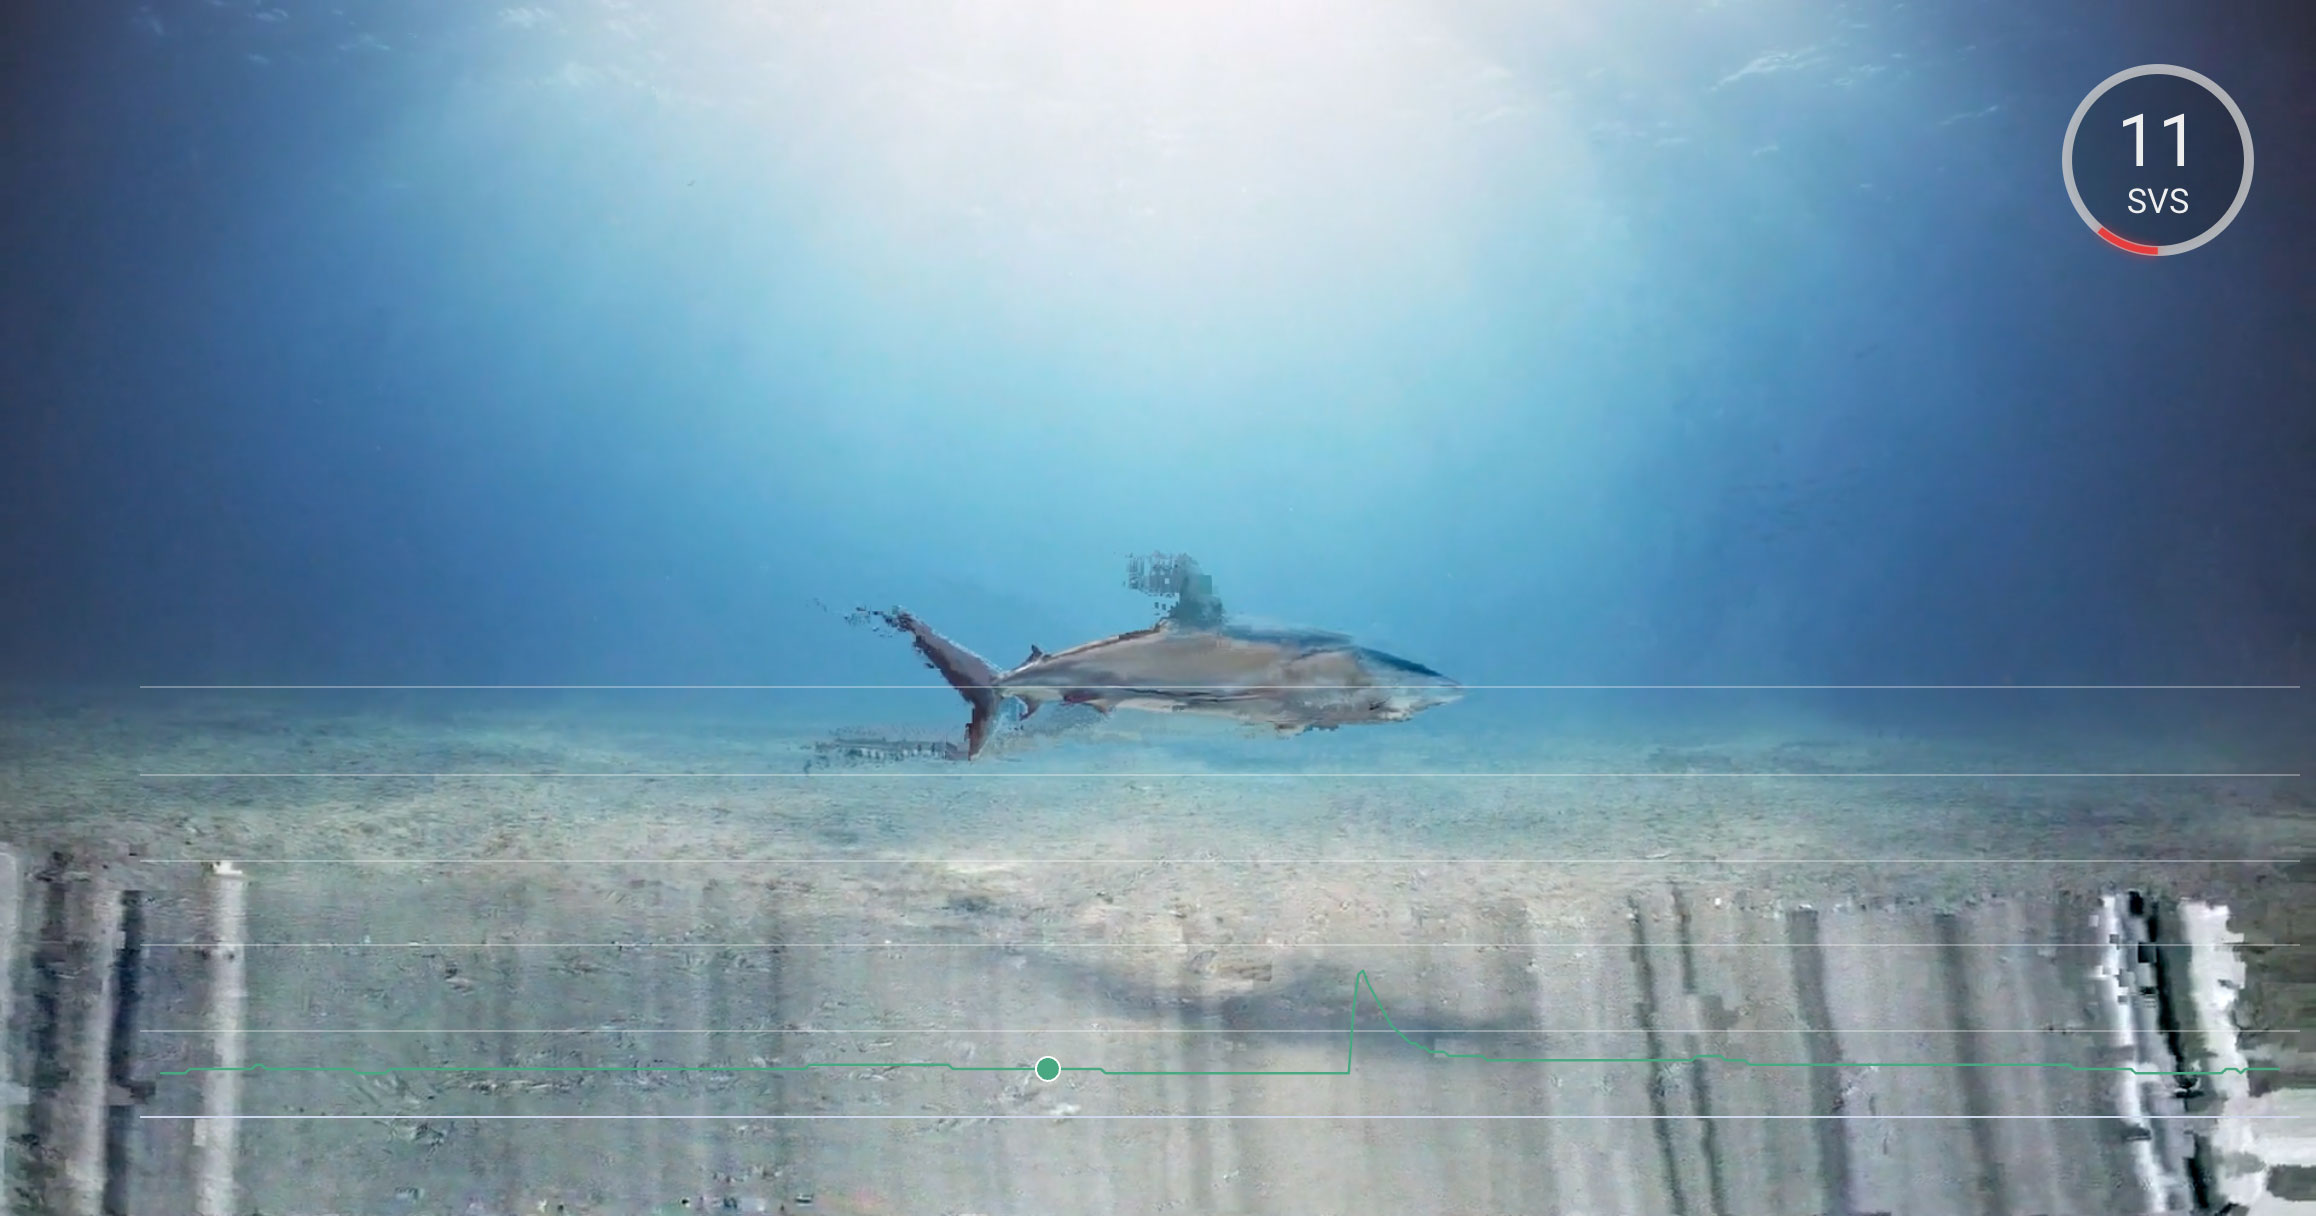 Macroblocking affect on a shark underwater